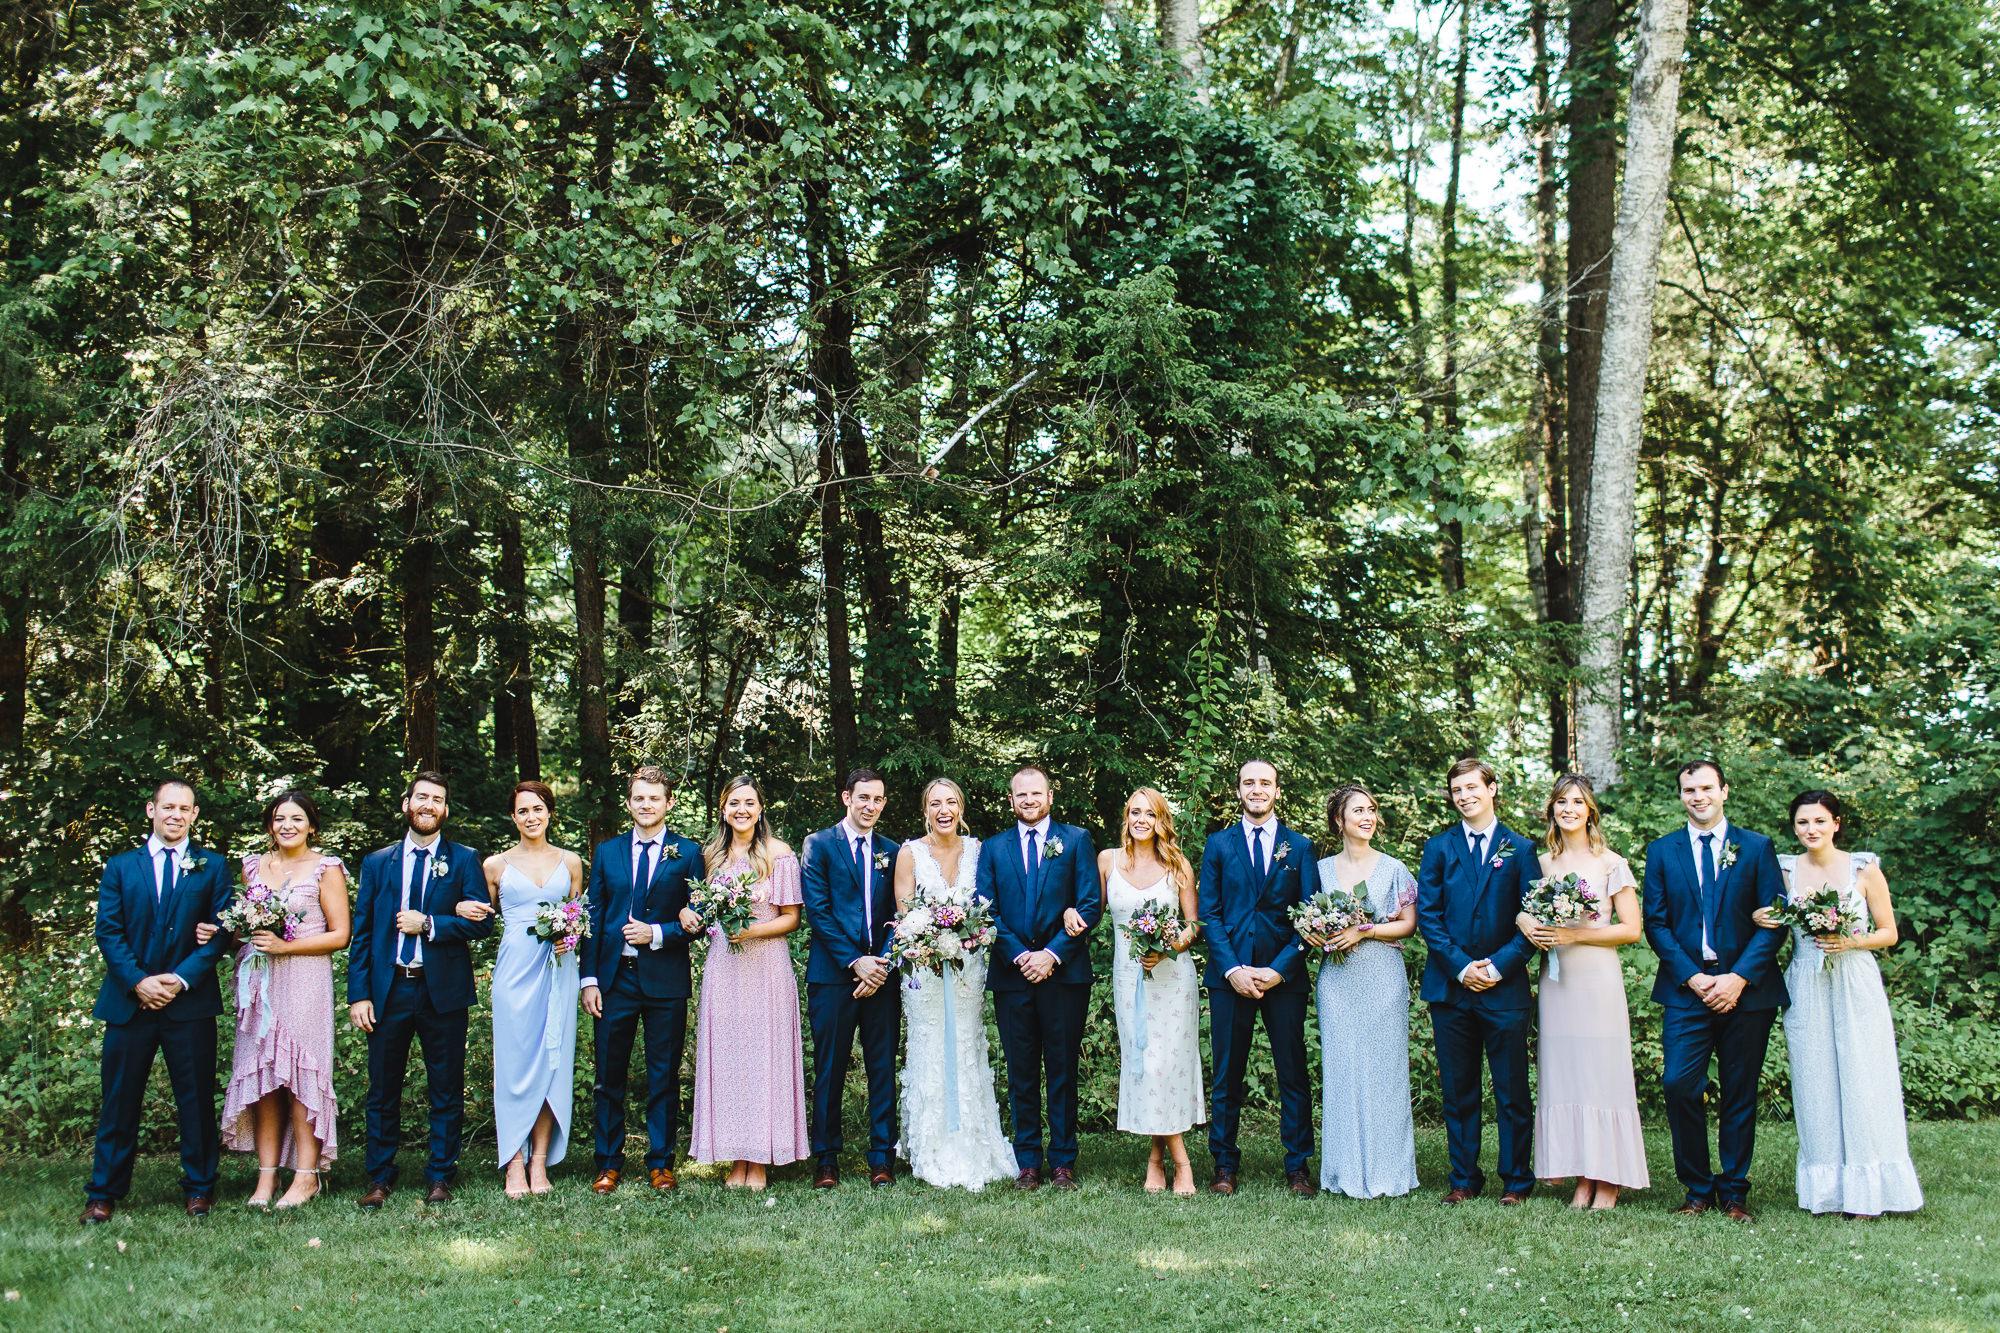 connecticut-summer-lake-wedding-emily-kirke-photography-upstyle (71 of 181).jpg